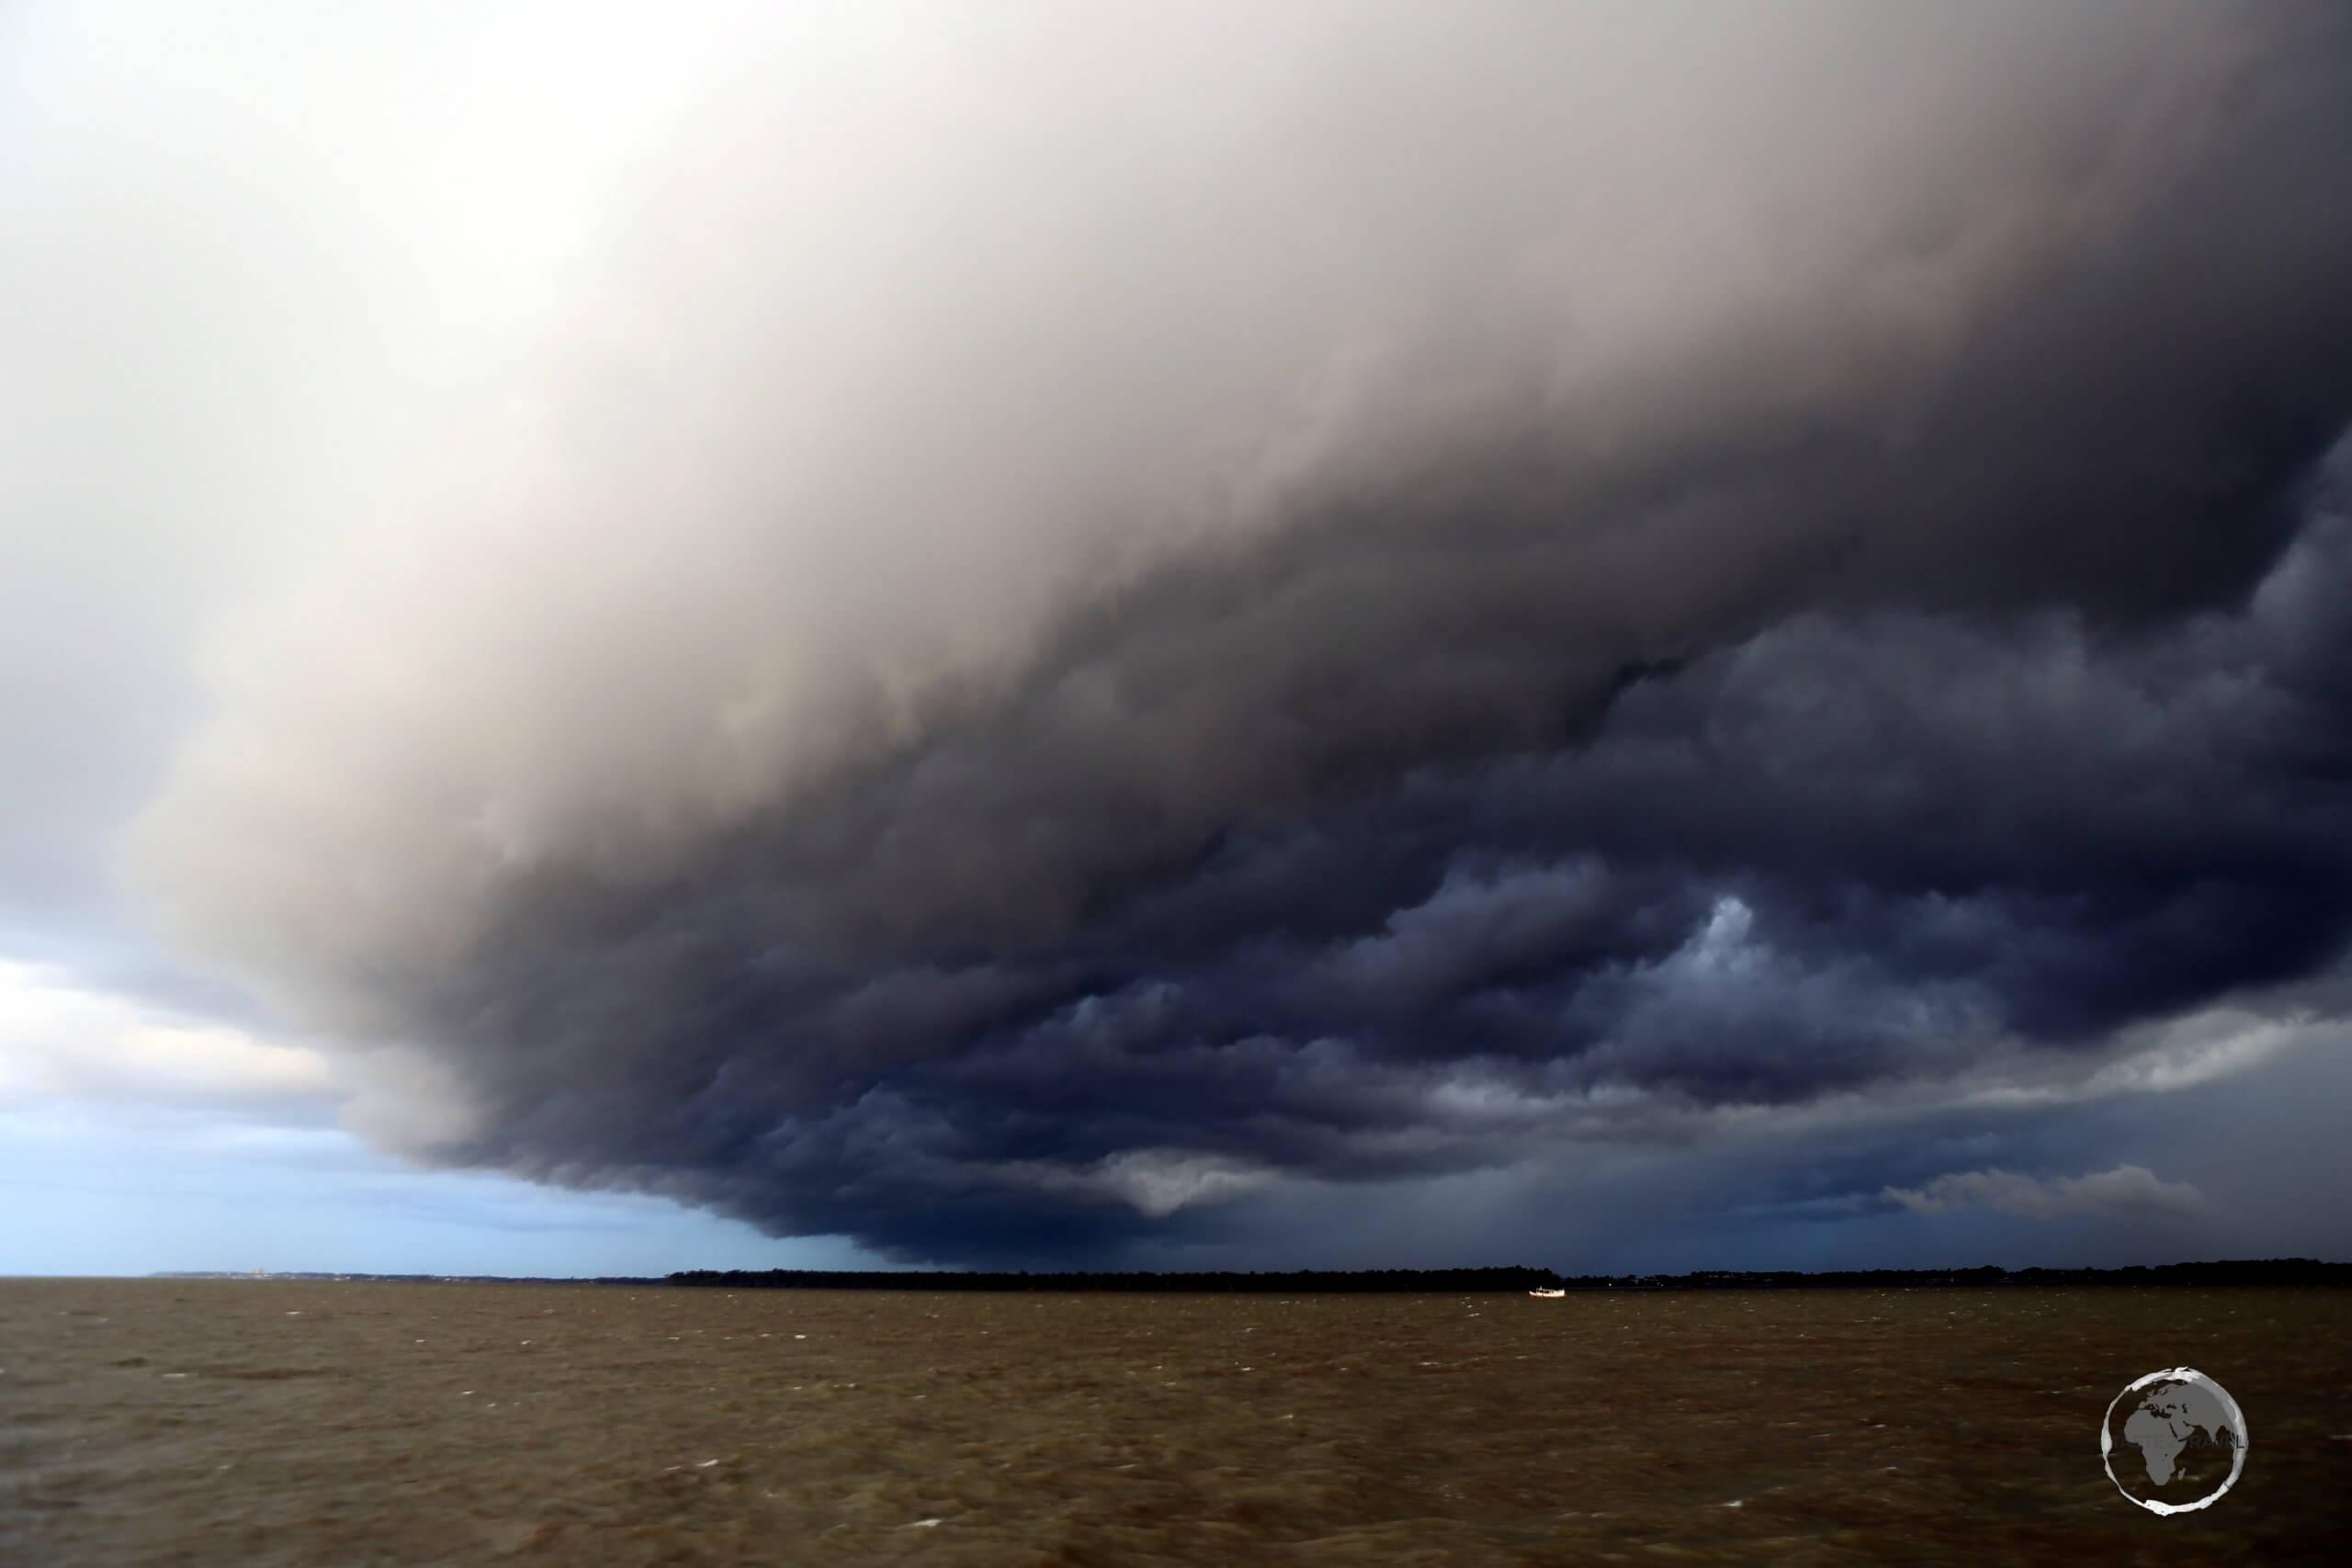 Storm clouds over the Amazon river near Belém.